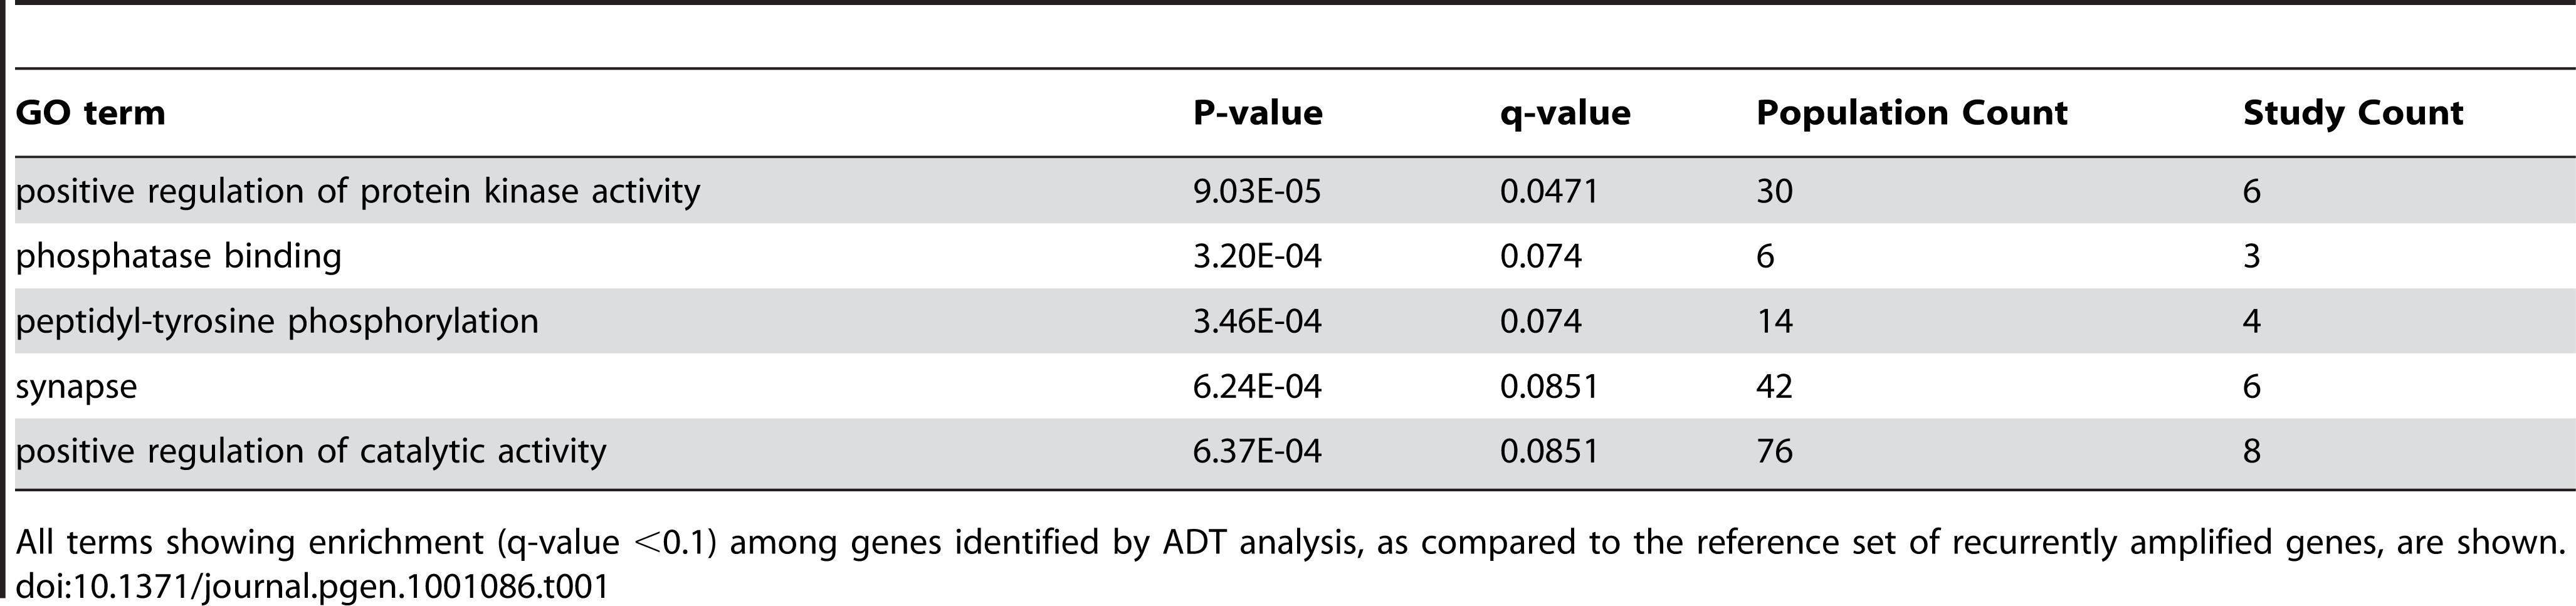 Gene ontology analysis results.